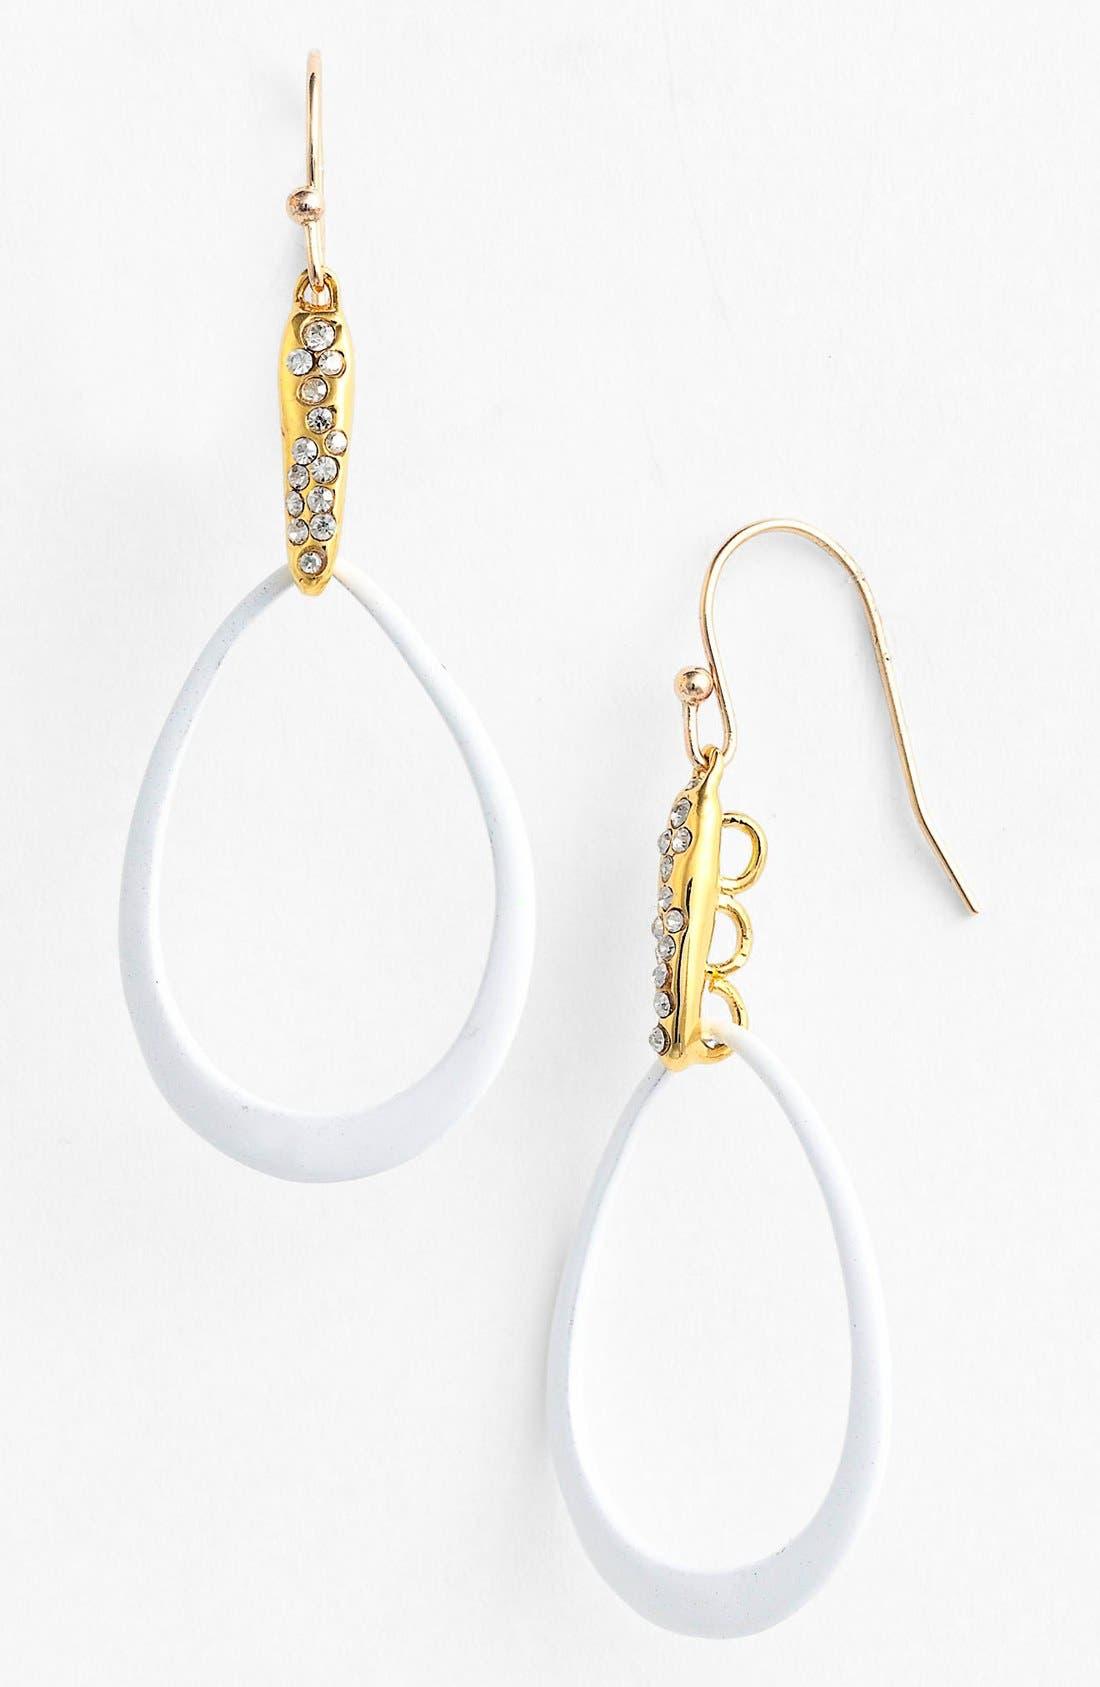 Alternate Image 1 Selected - Alexis Bittar 'Miss Havisham - Liquid Gold' Open Teardrop Earrings